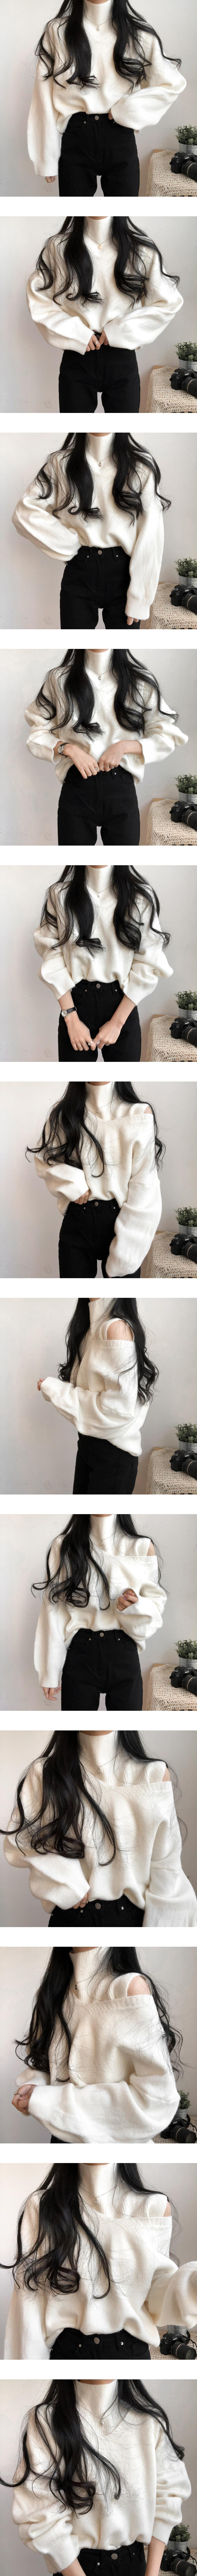 jacket detail image-S1L7